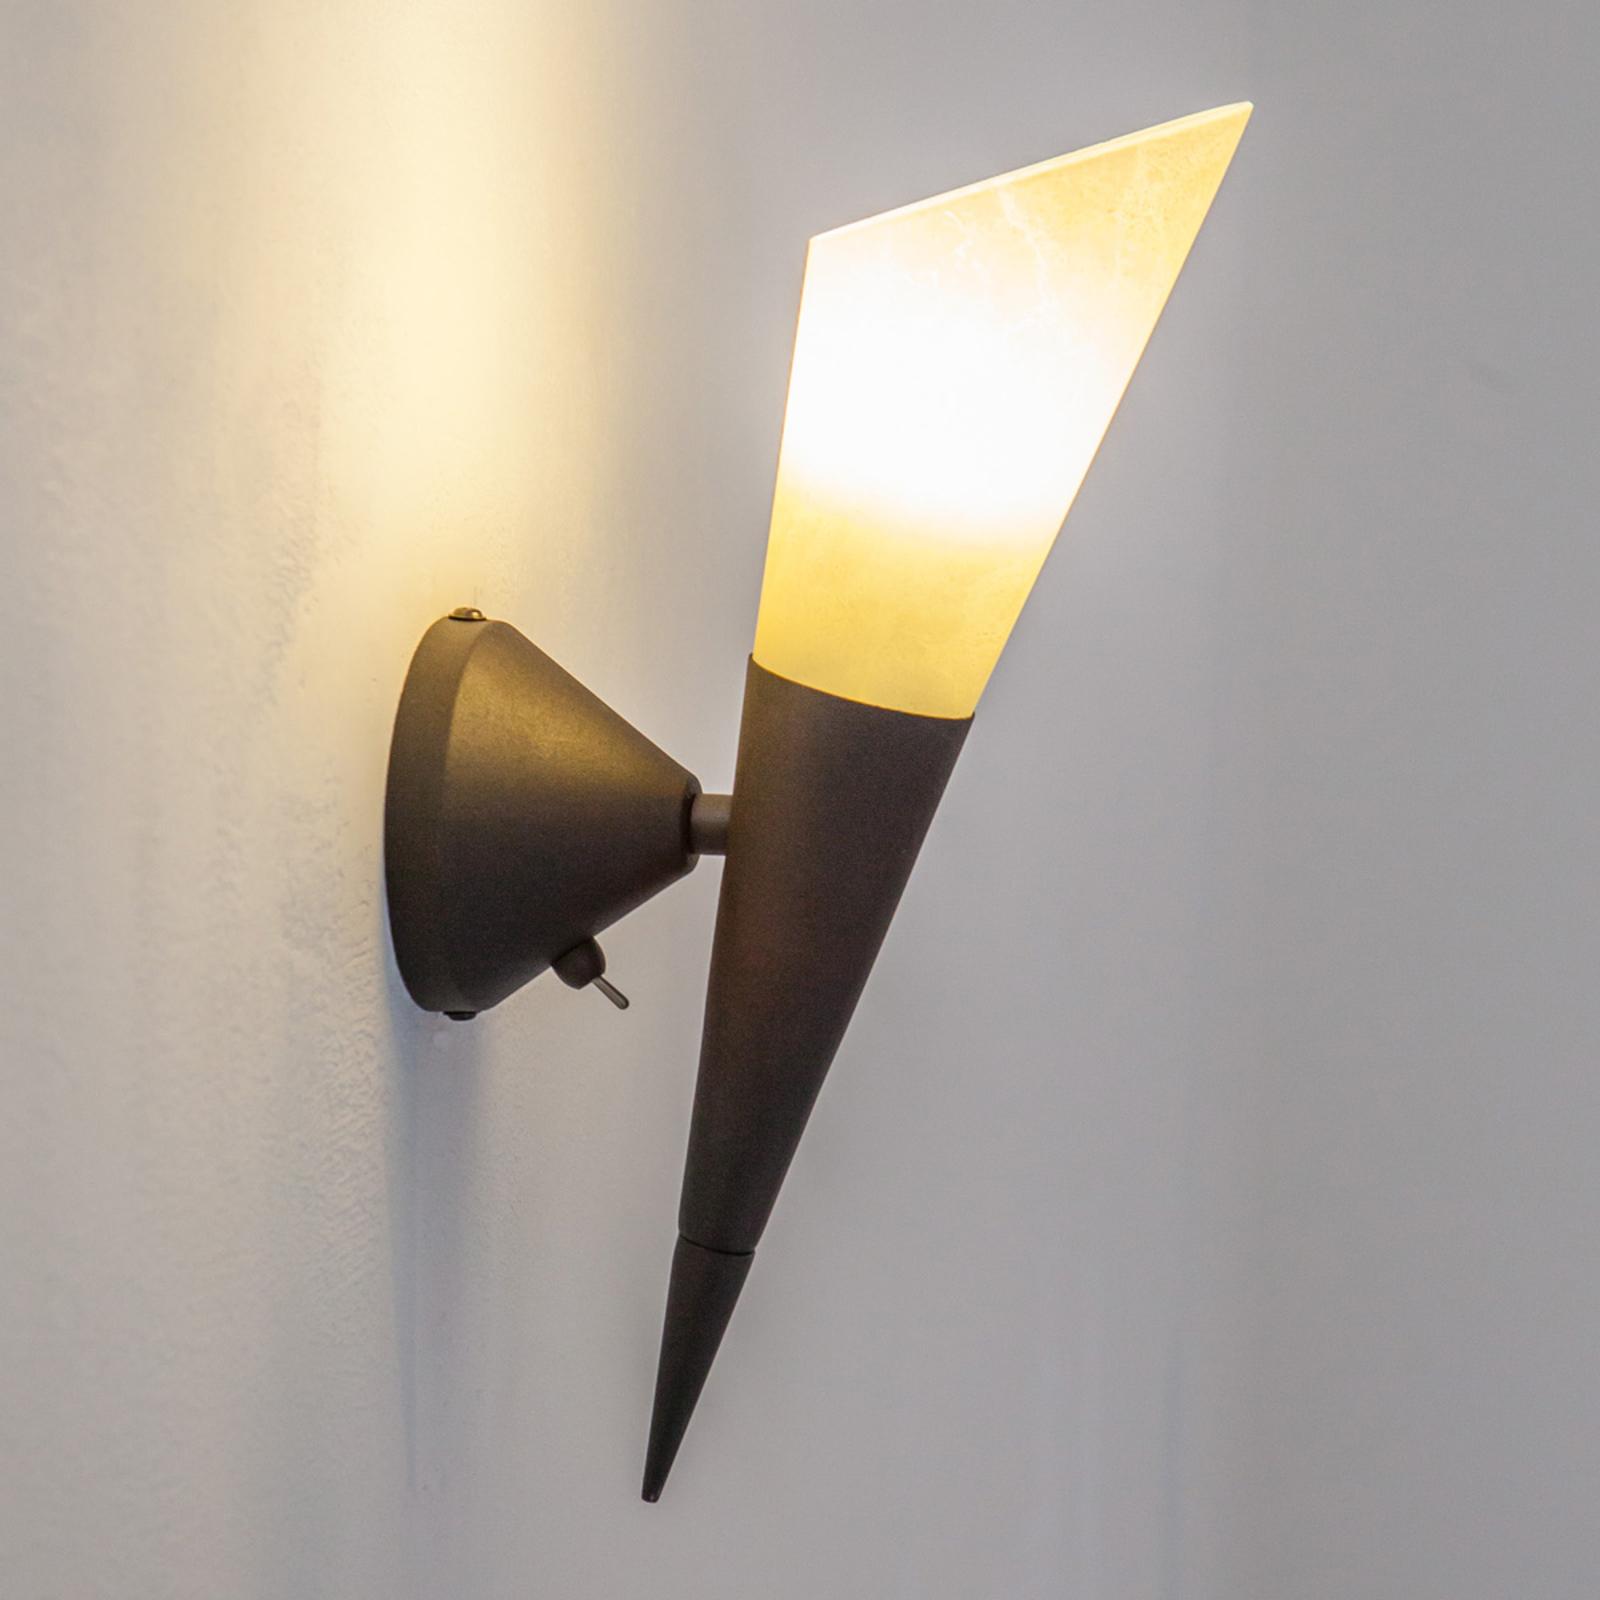 Alva wall light with an E14 LED lamp_9620107_1